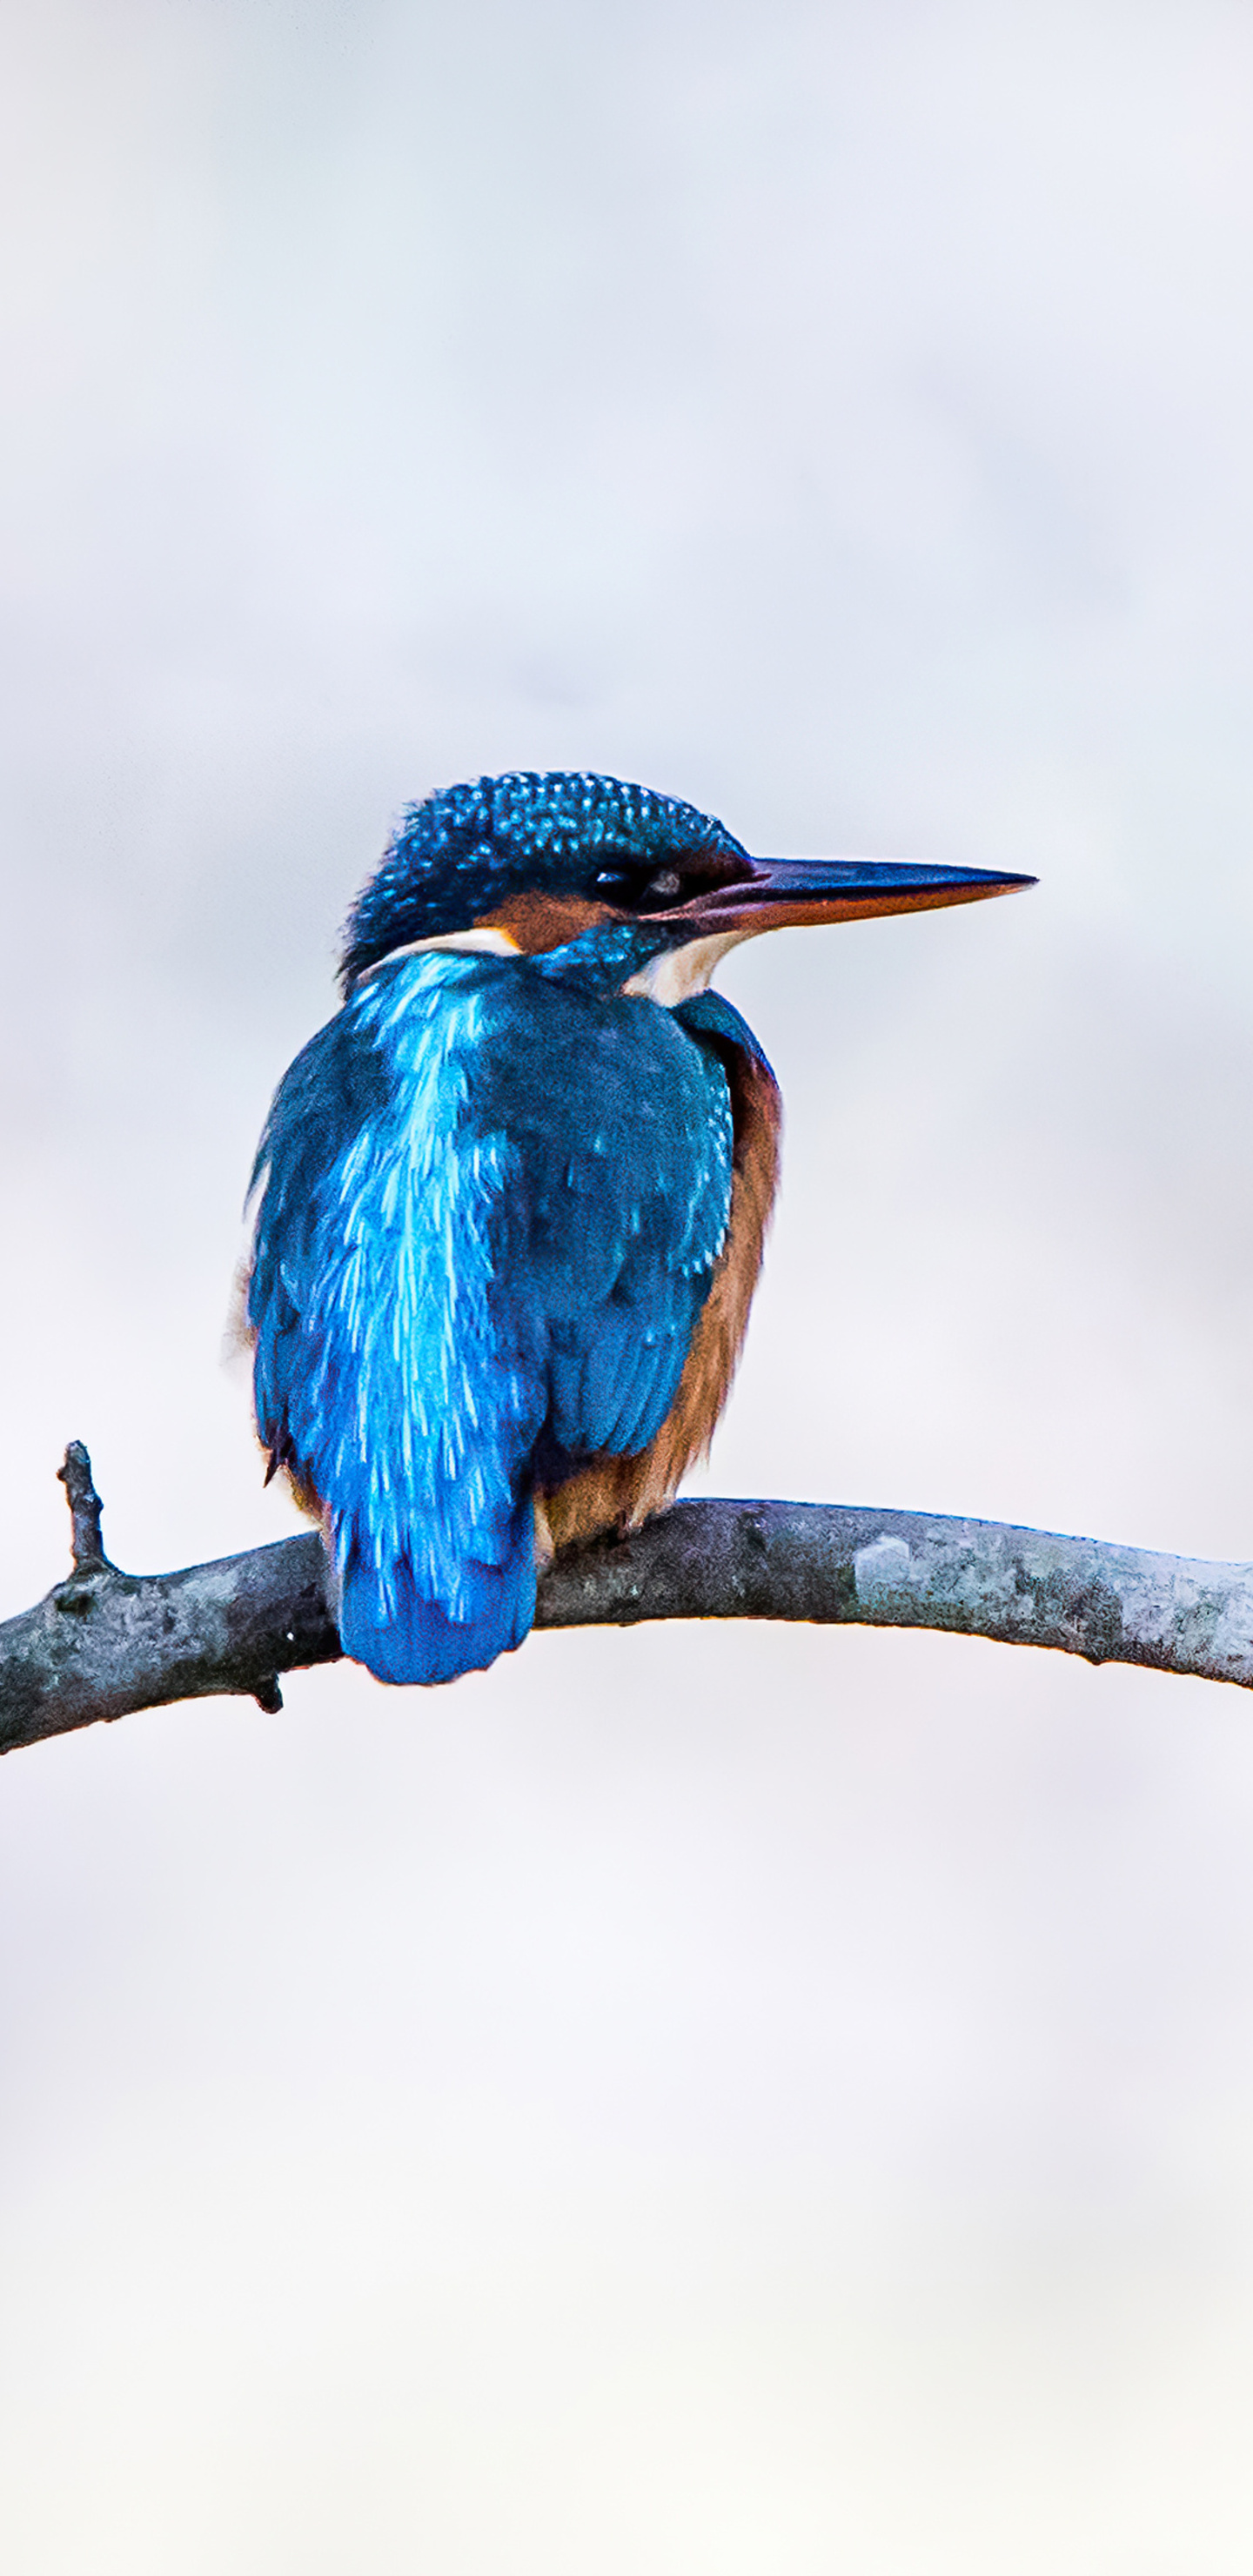 river-kingfisher-4k-w8.jpg